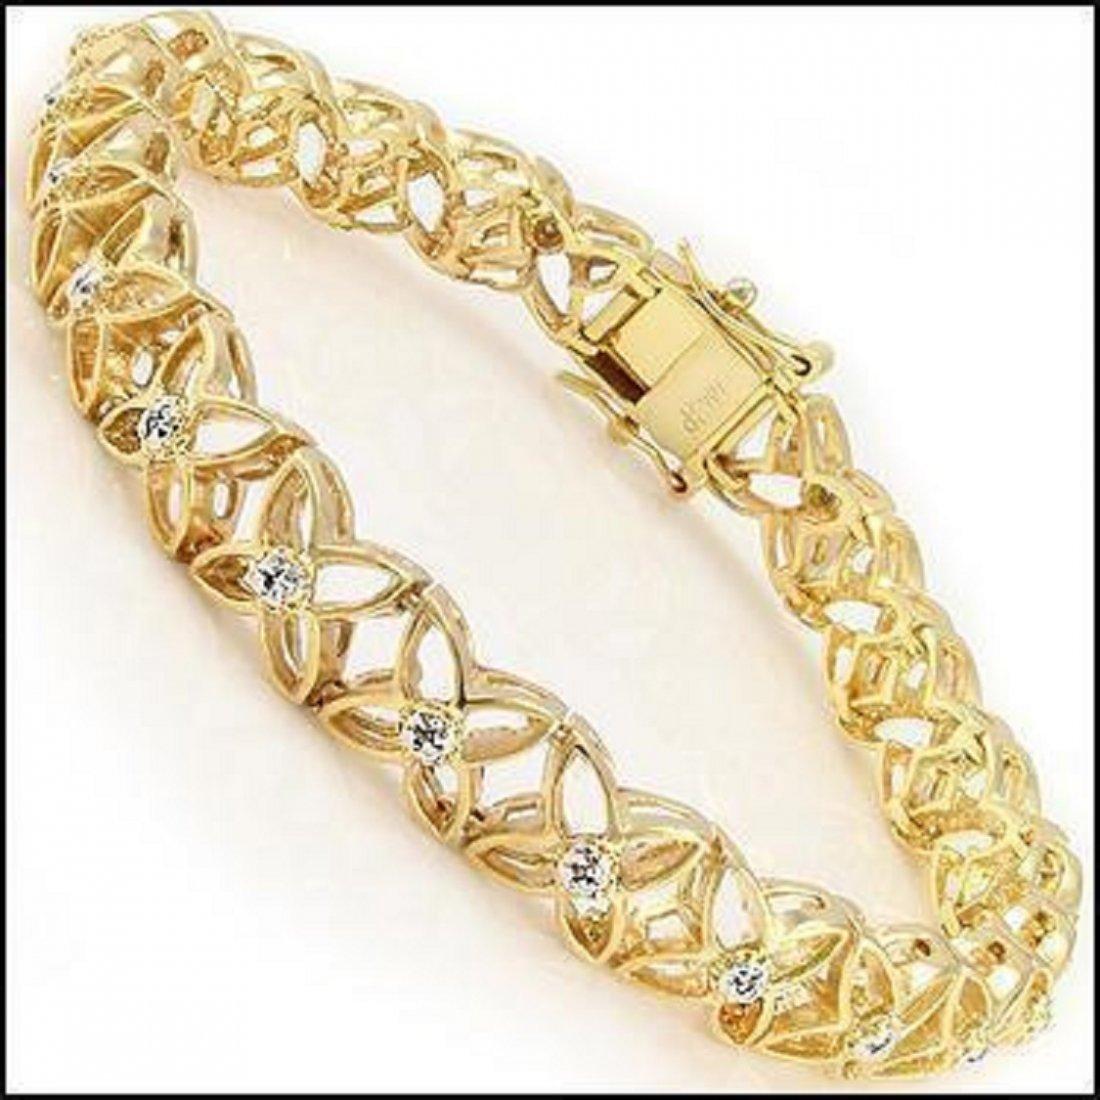 0.77 CT Diamond 18K Fine Designer Bracelet $1570